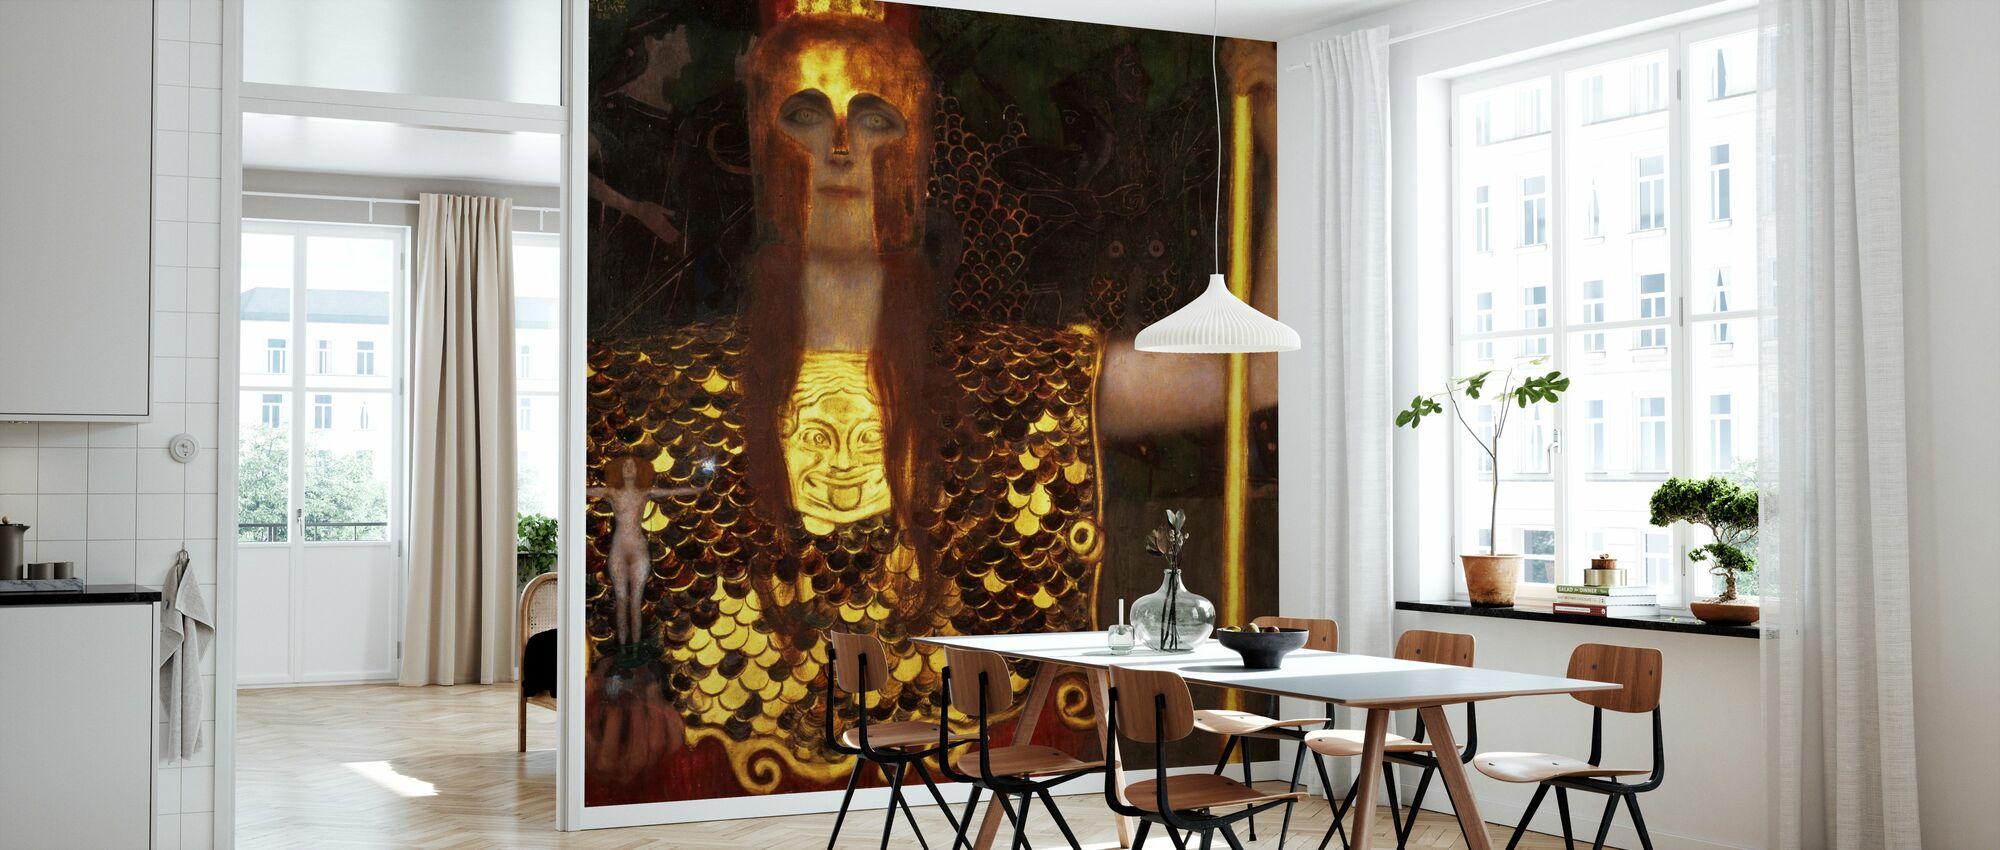 Minerva or Pallas Athena, Gustav Klimt - Wallpaper - Kitchen